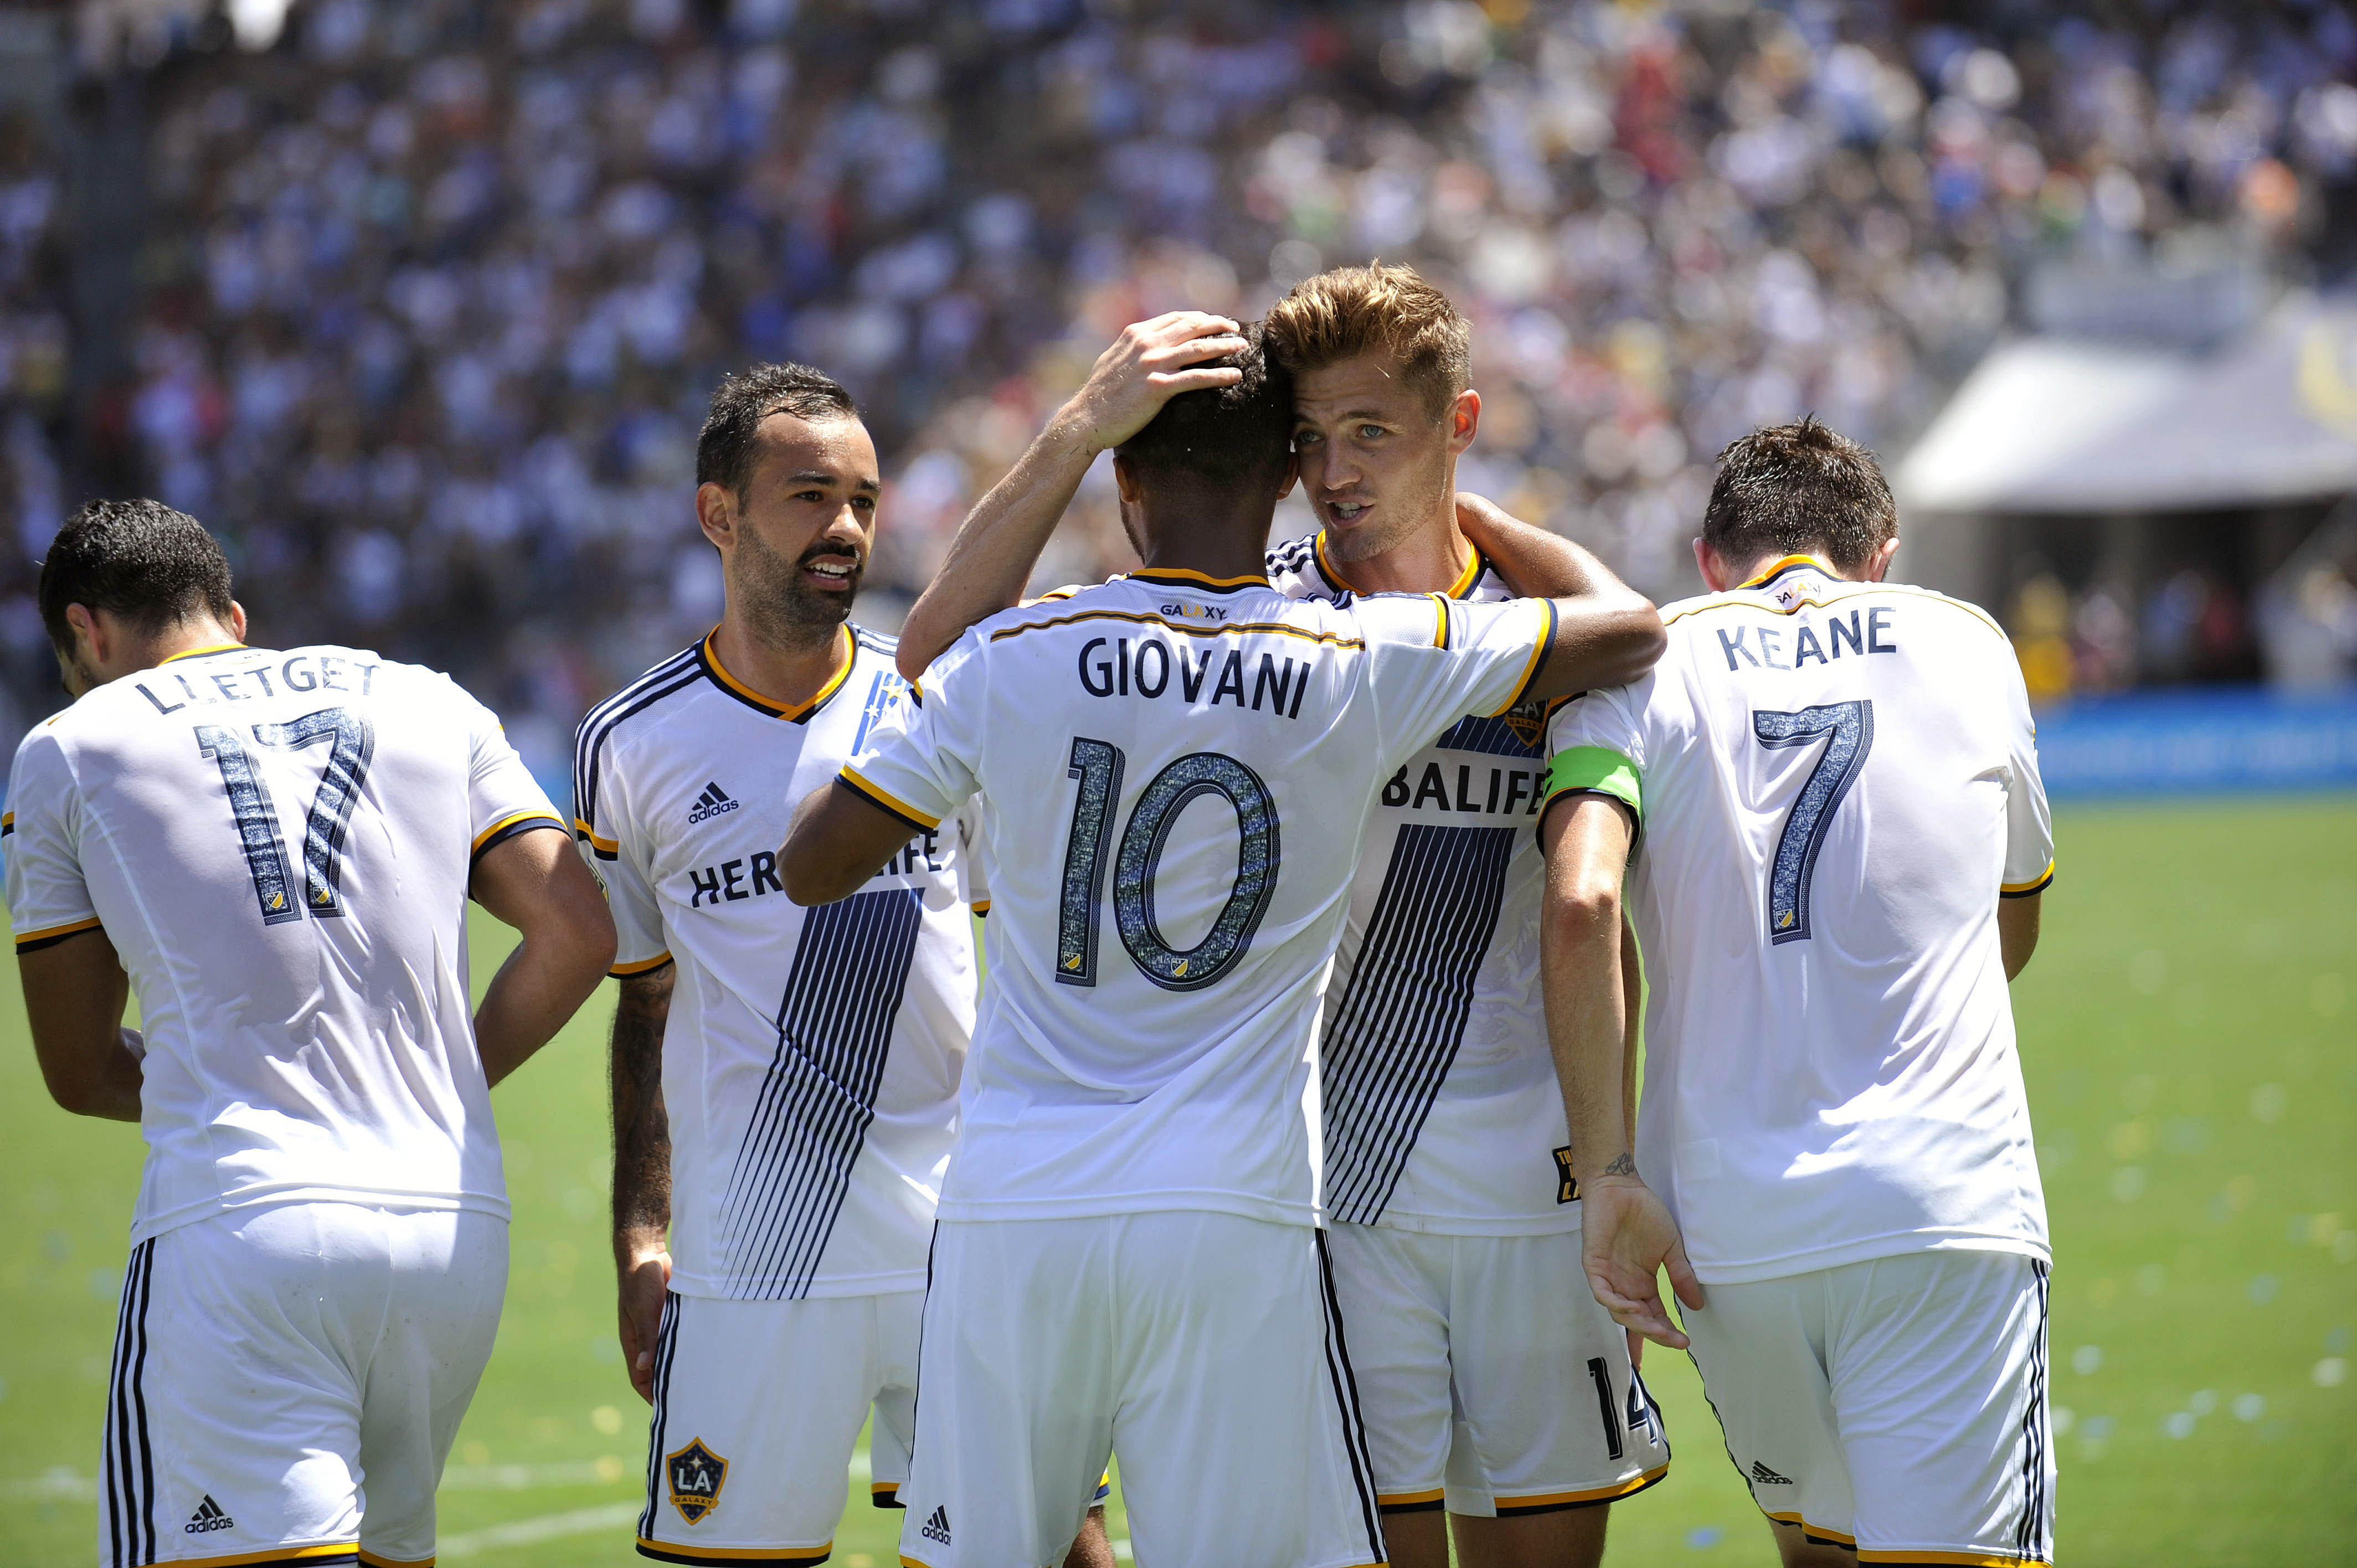 MLS: New York City FC at LA Galaxy